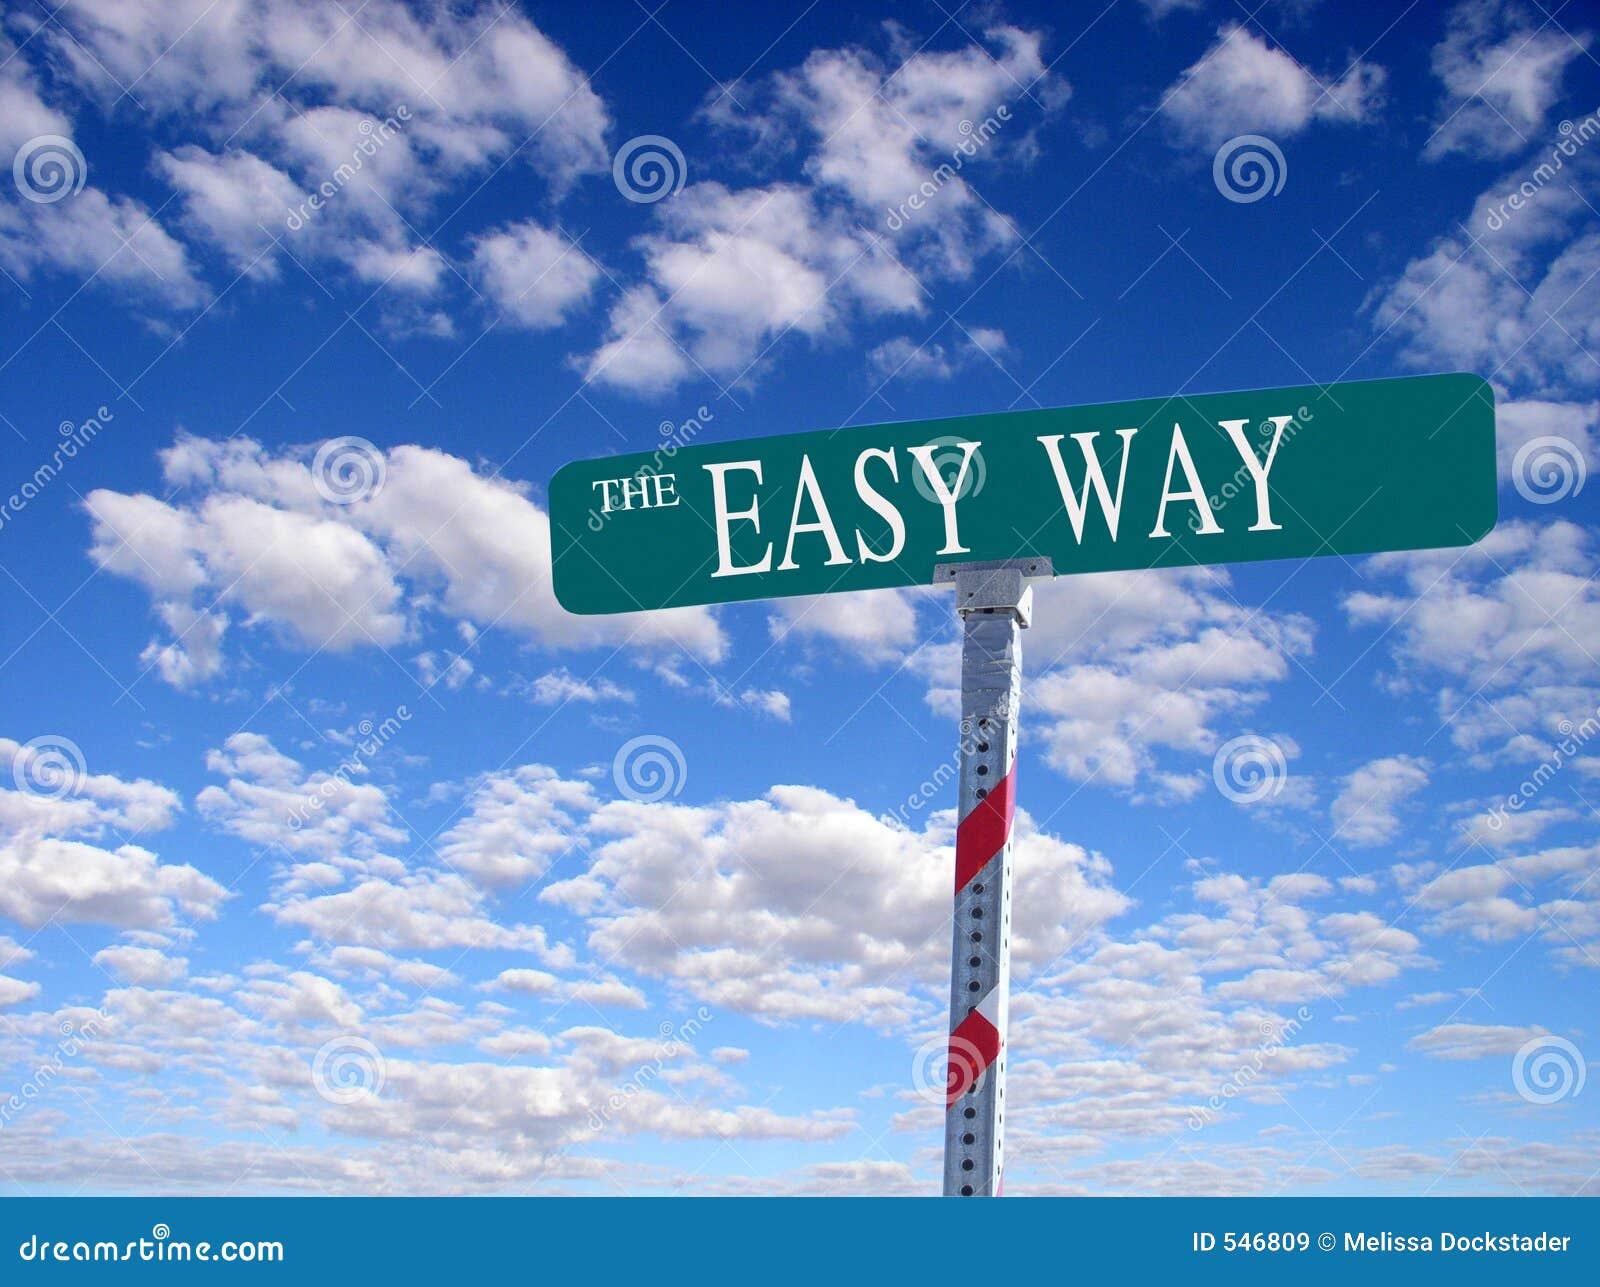 Download 容易的方法 库存图片. 图片 包括有 背包, 蓝色, 驱动器, 投资, 营销, 想法, 信息, 刺激, 帮助 - 546809